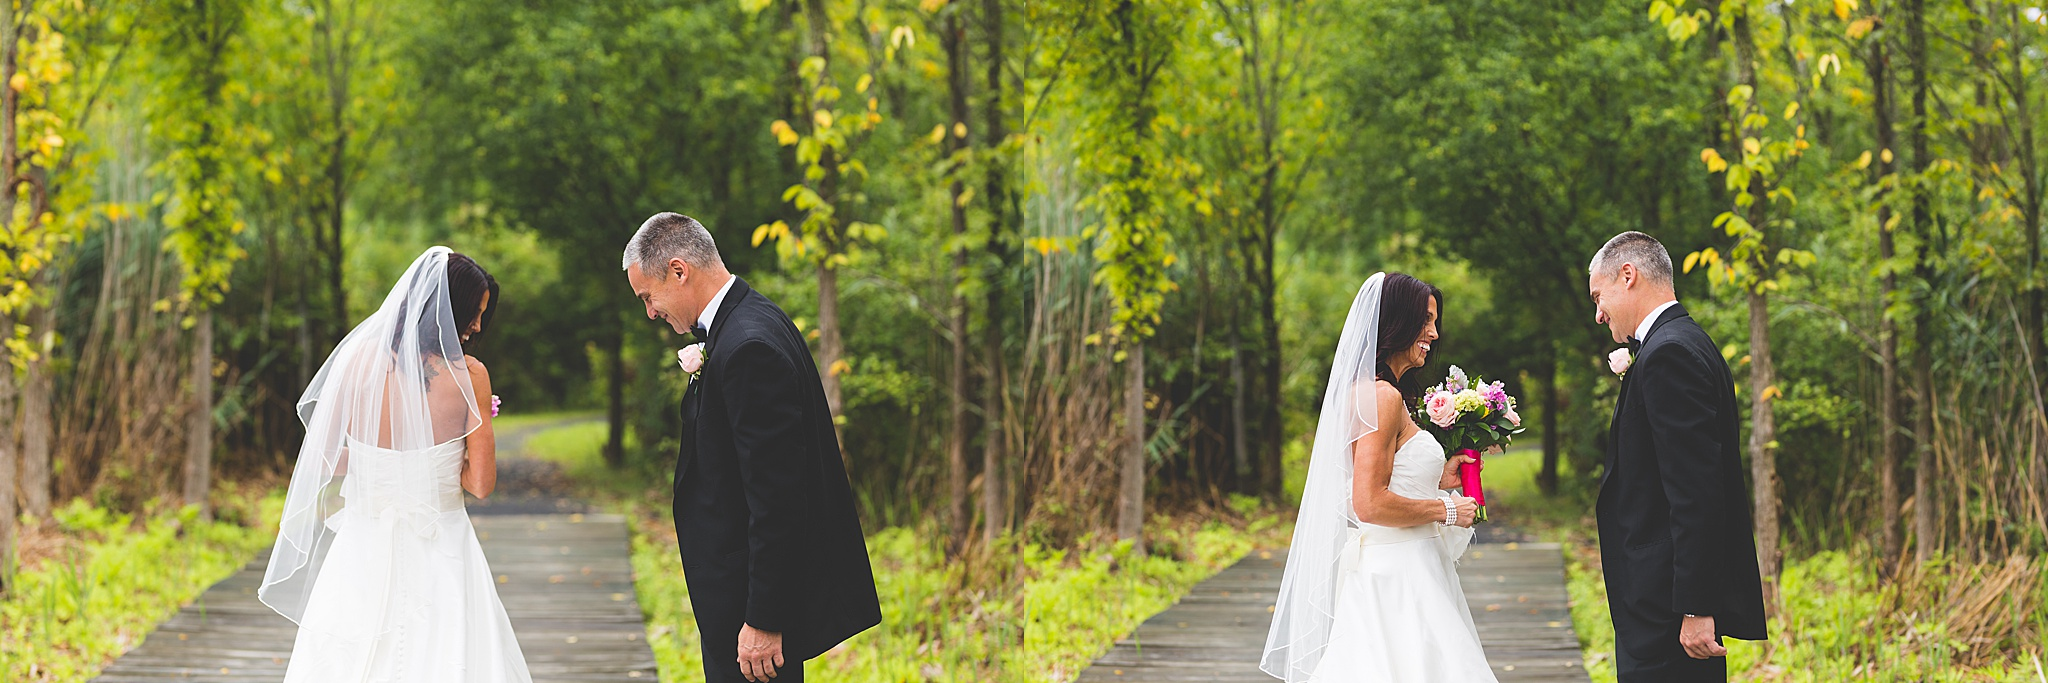 Albany_Wedding_Photographer_7606.jpg